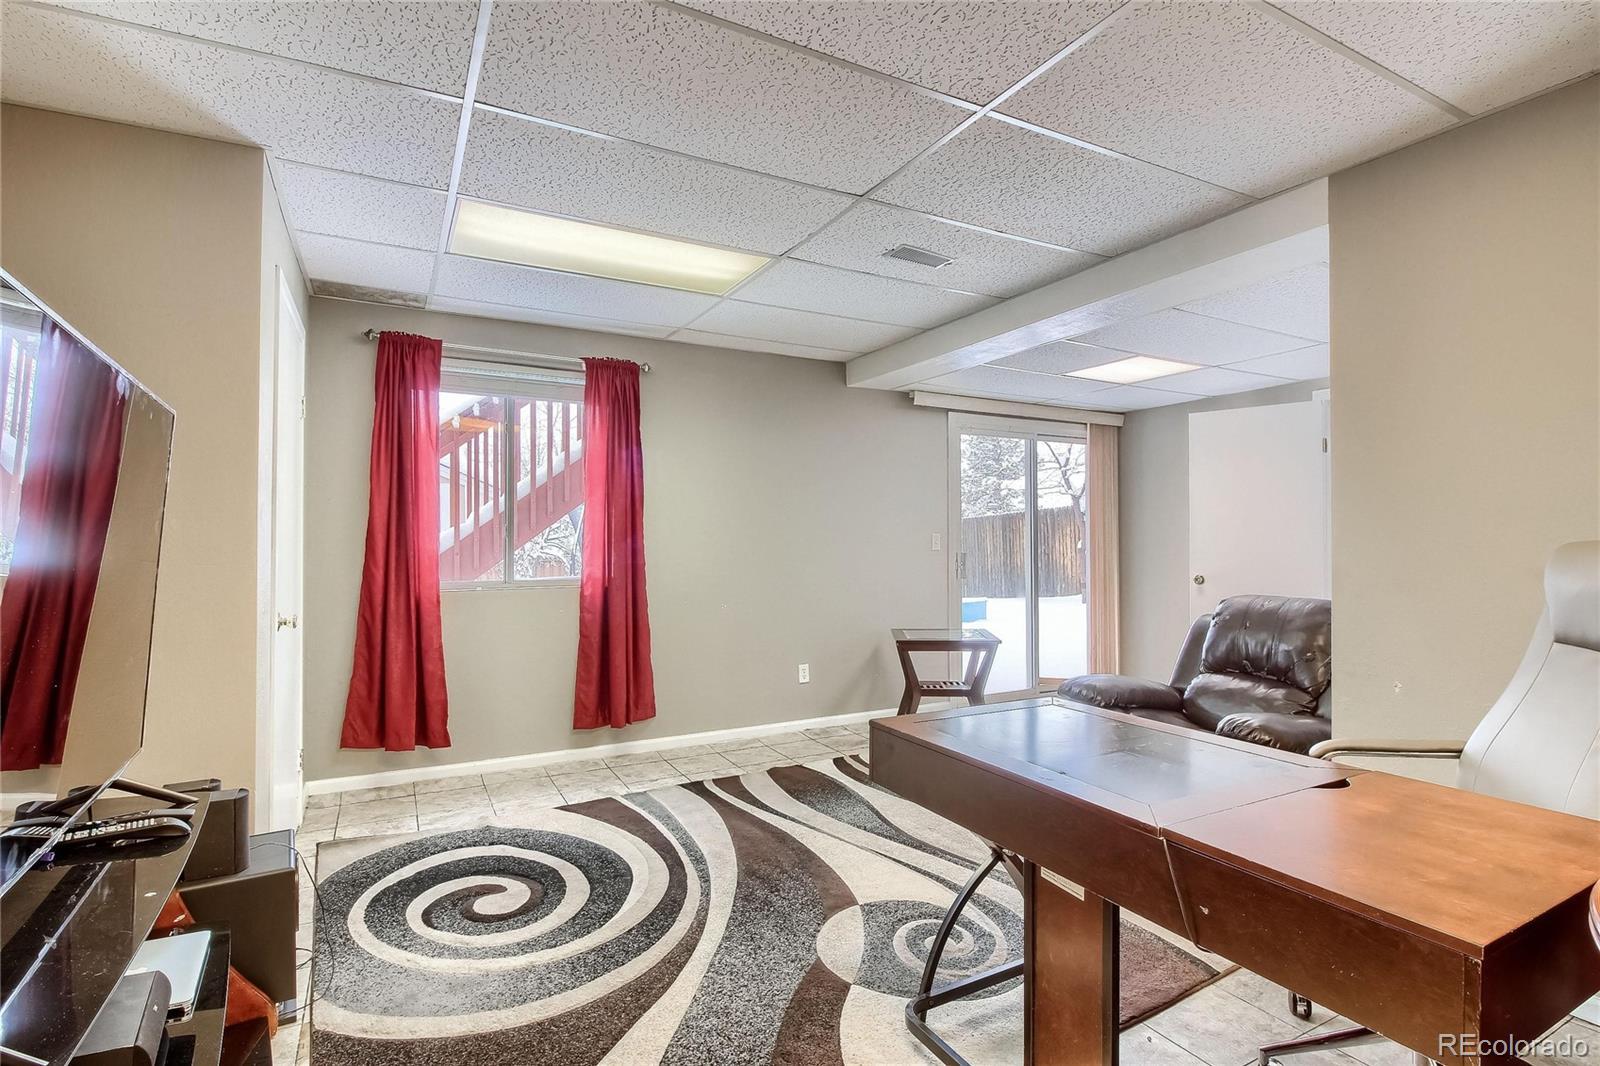 MLS# 4928341 - 32 - 19695 E Hampden Place, Aurora, CO 80013